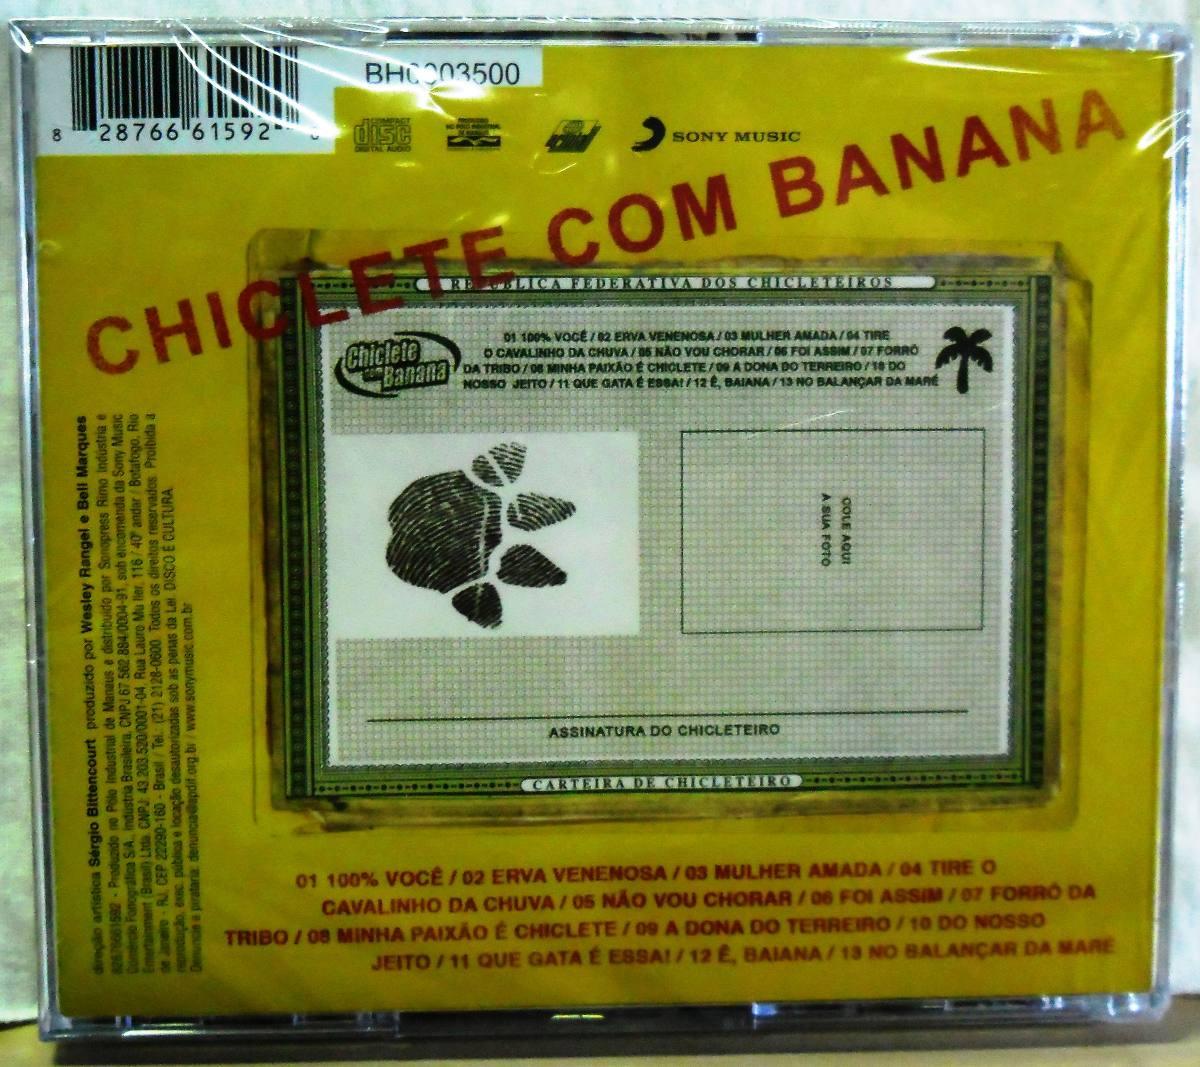 cd de chiclete com banana sou chicleteiro